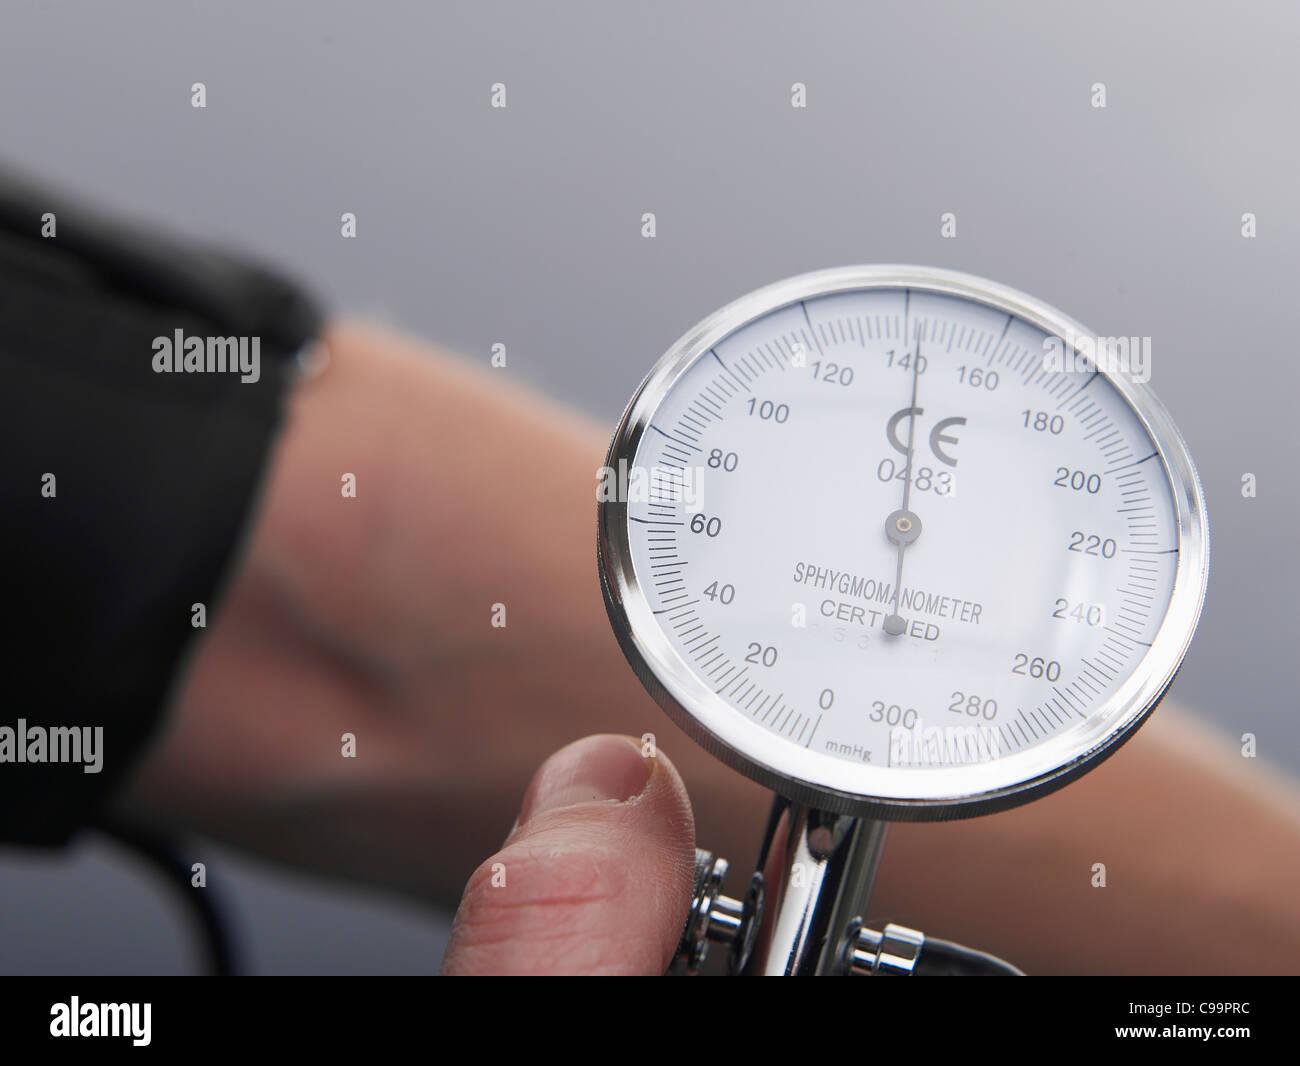 Human hand holding blood pressure gauge, close up - Stock Image